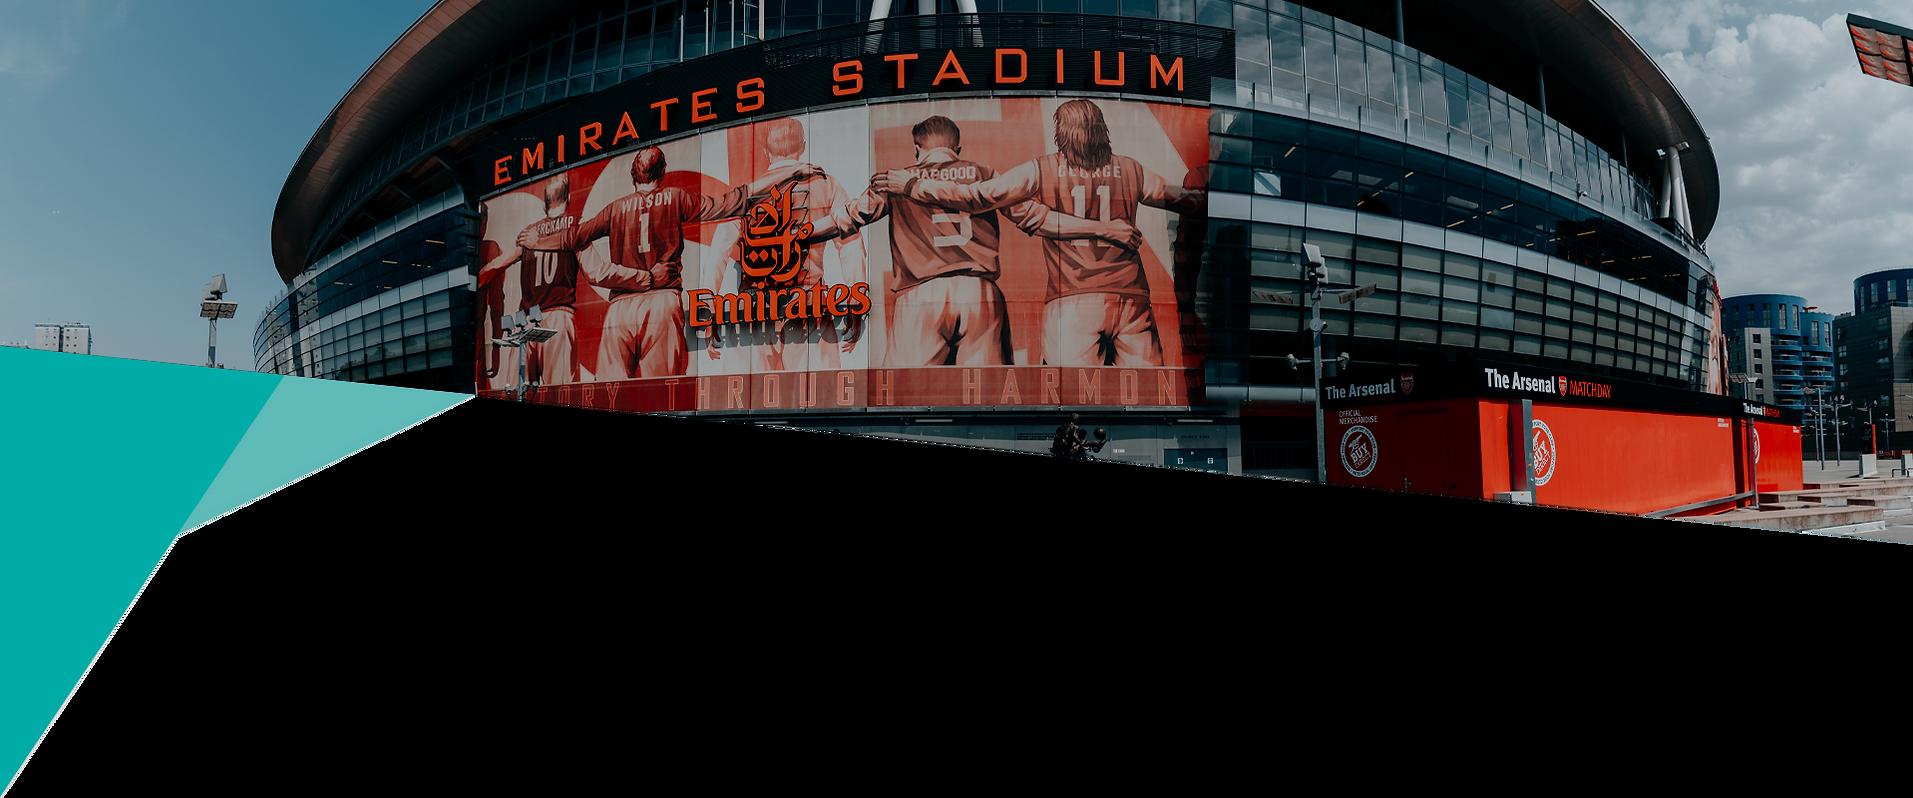 Emirates_edited.png